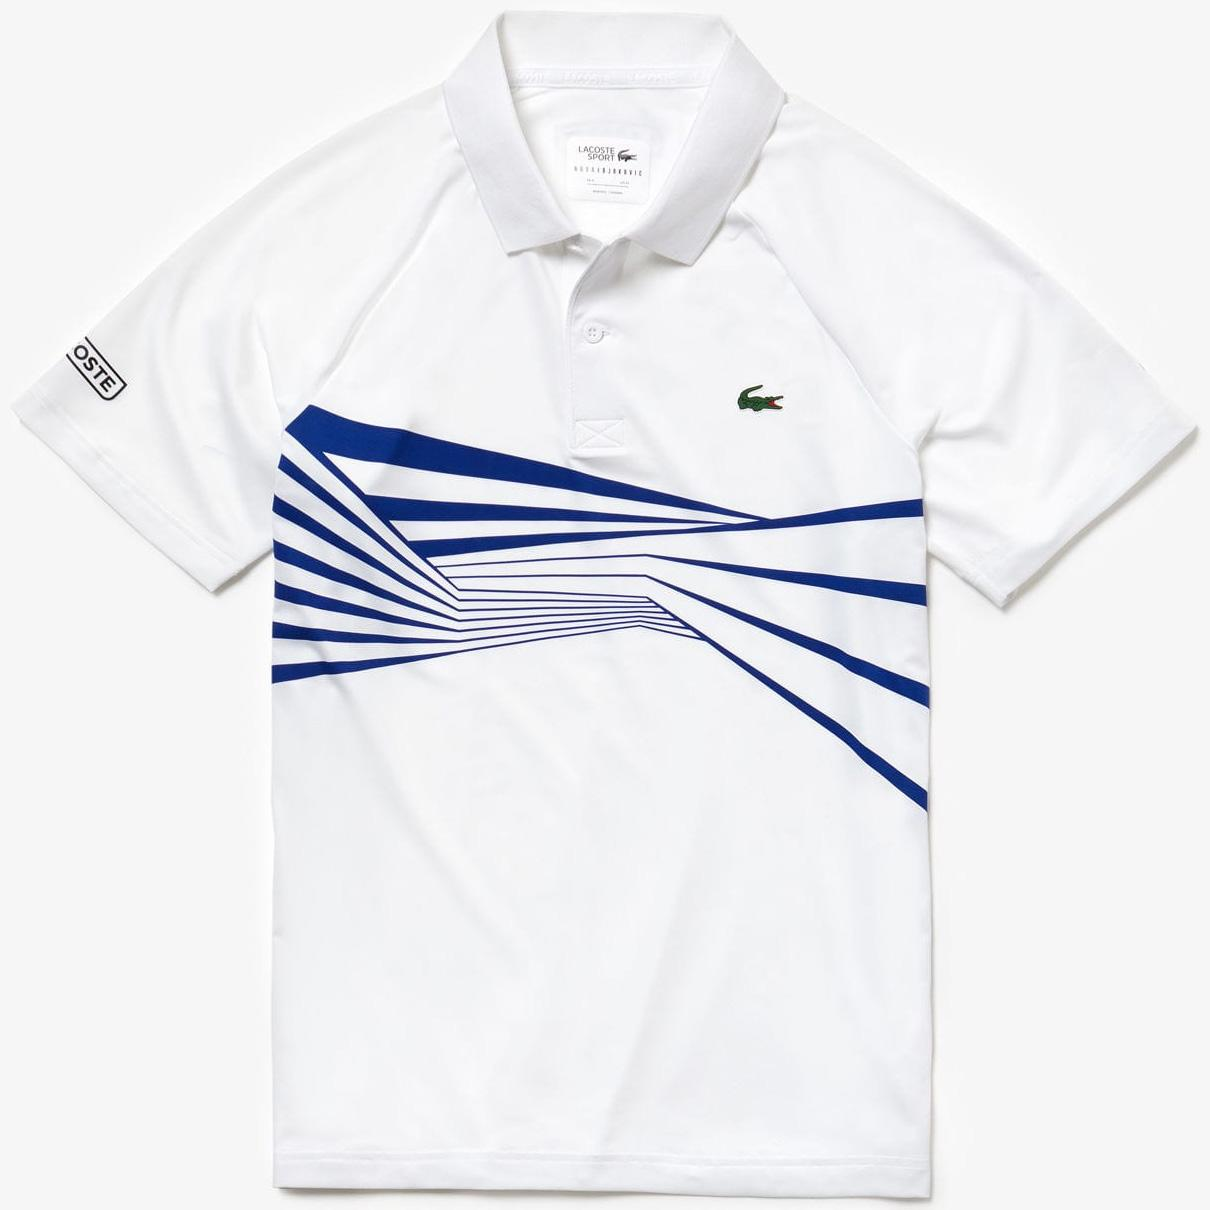 59fca41c Lacoste Mens Djokovic Graphic Print Polo - White/Blue